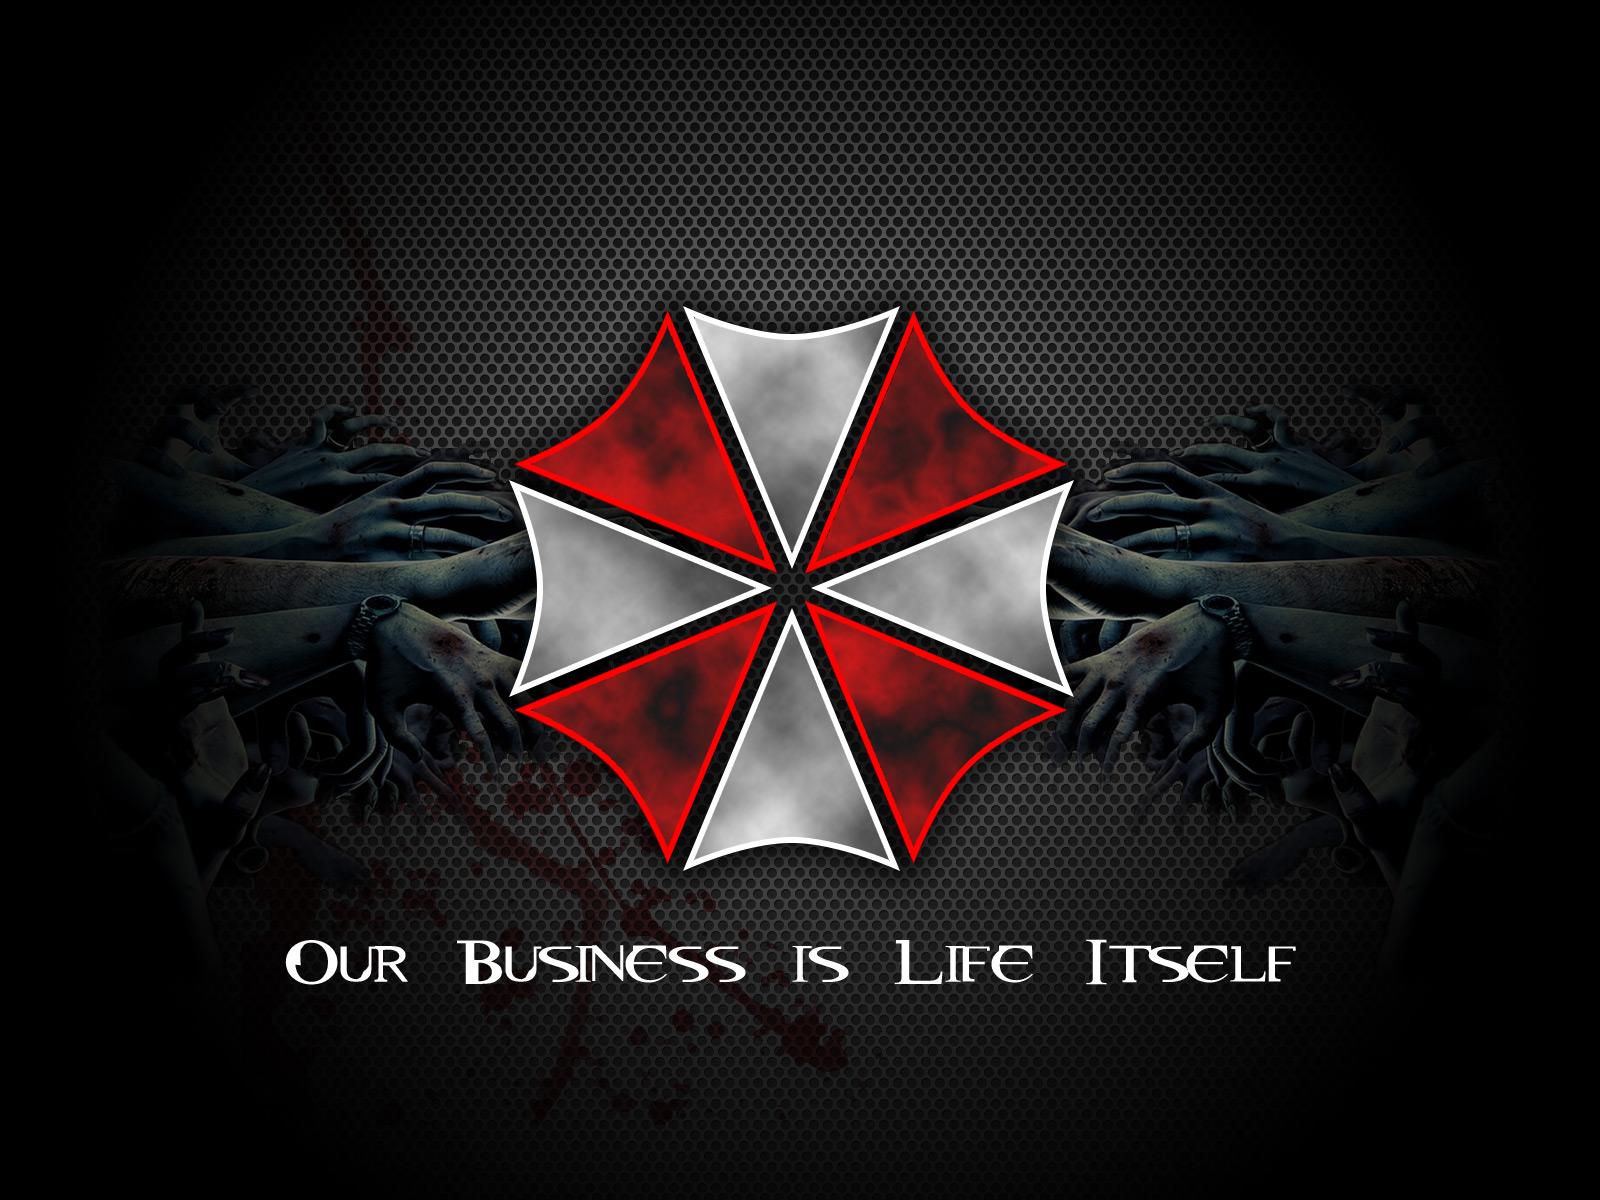 46 Resident Evil Umbrella Corp Wallpaper On Wallpapersafari